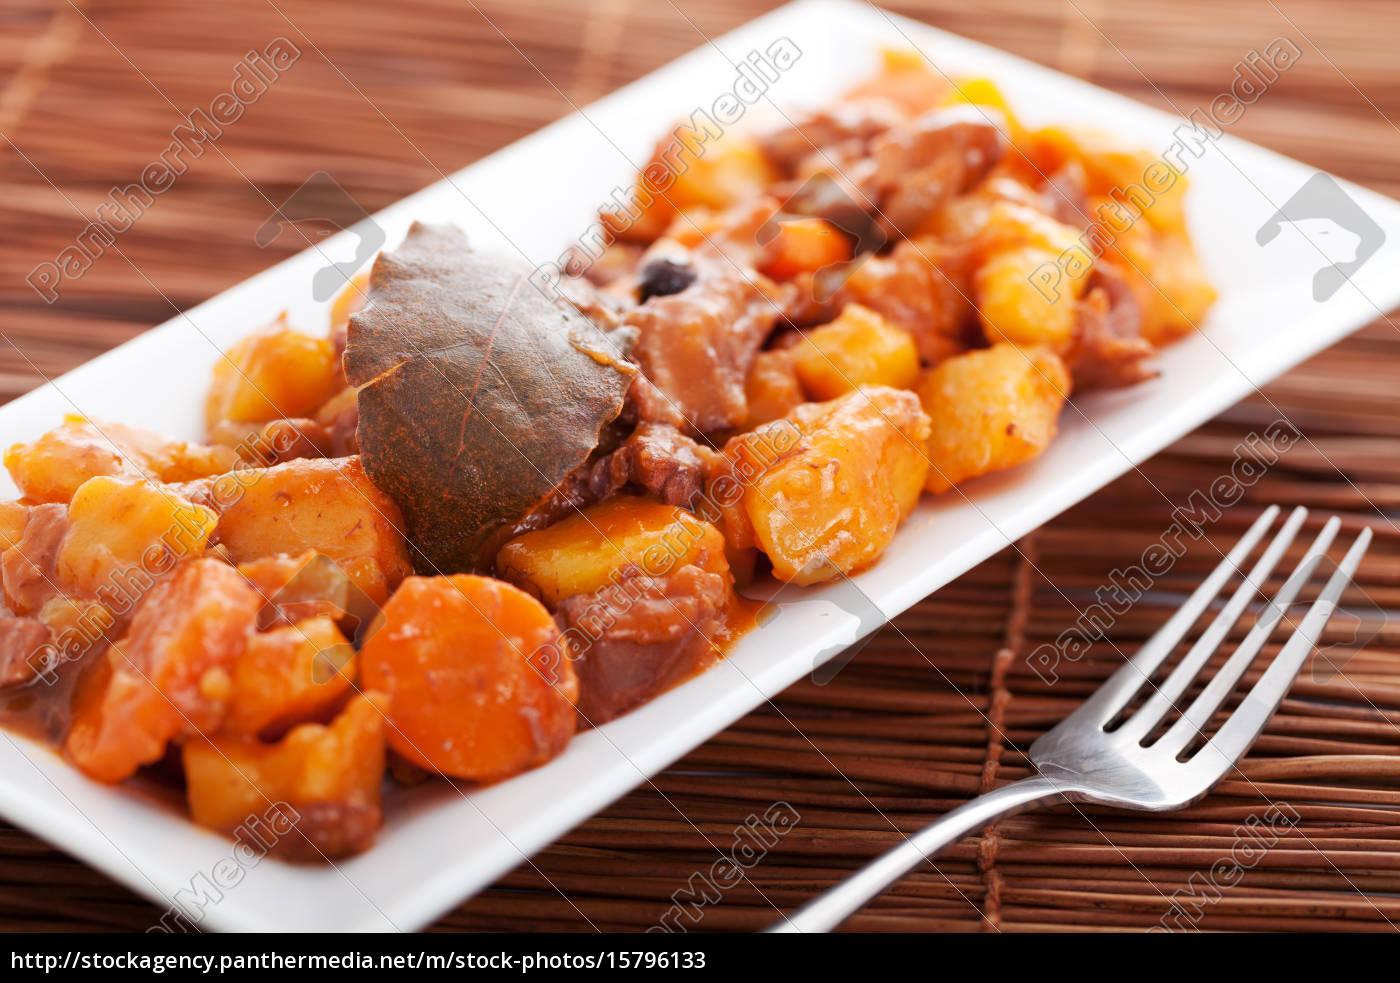 rabbit, stew, rabbit, stew, rabbit, stew, rabbit, stew, rabbit, stew, rabbit - 15796133